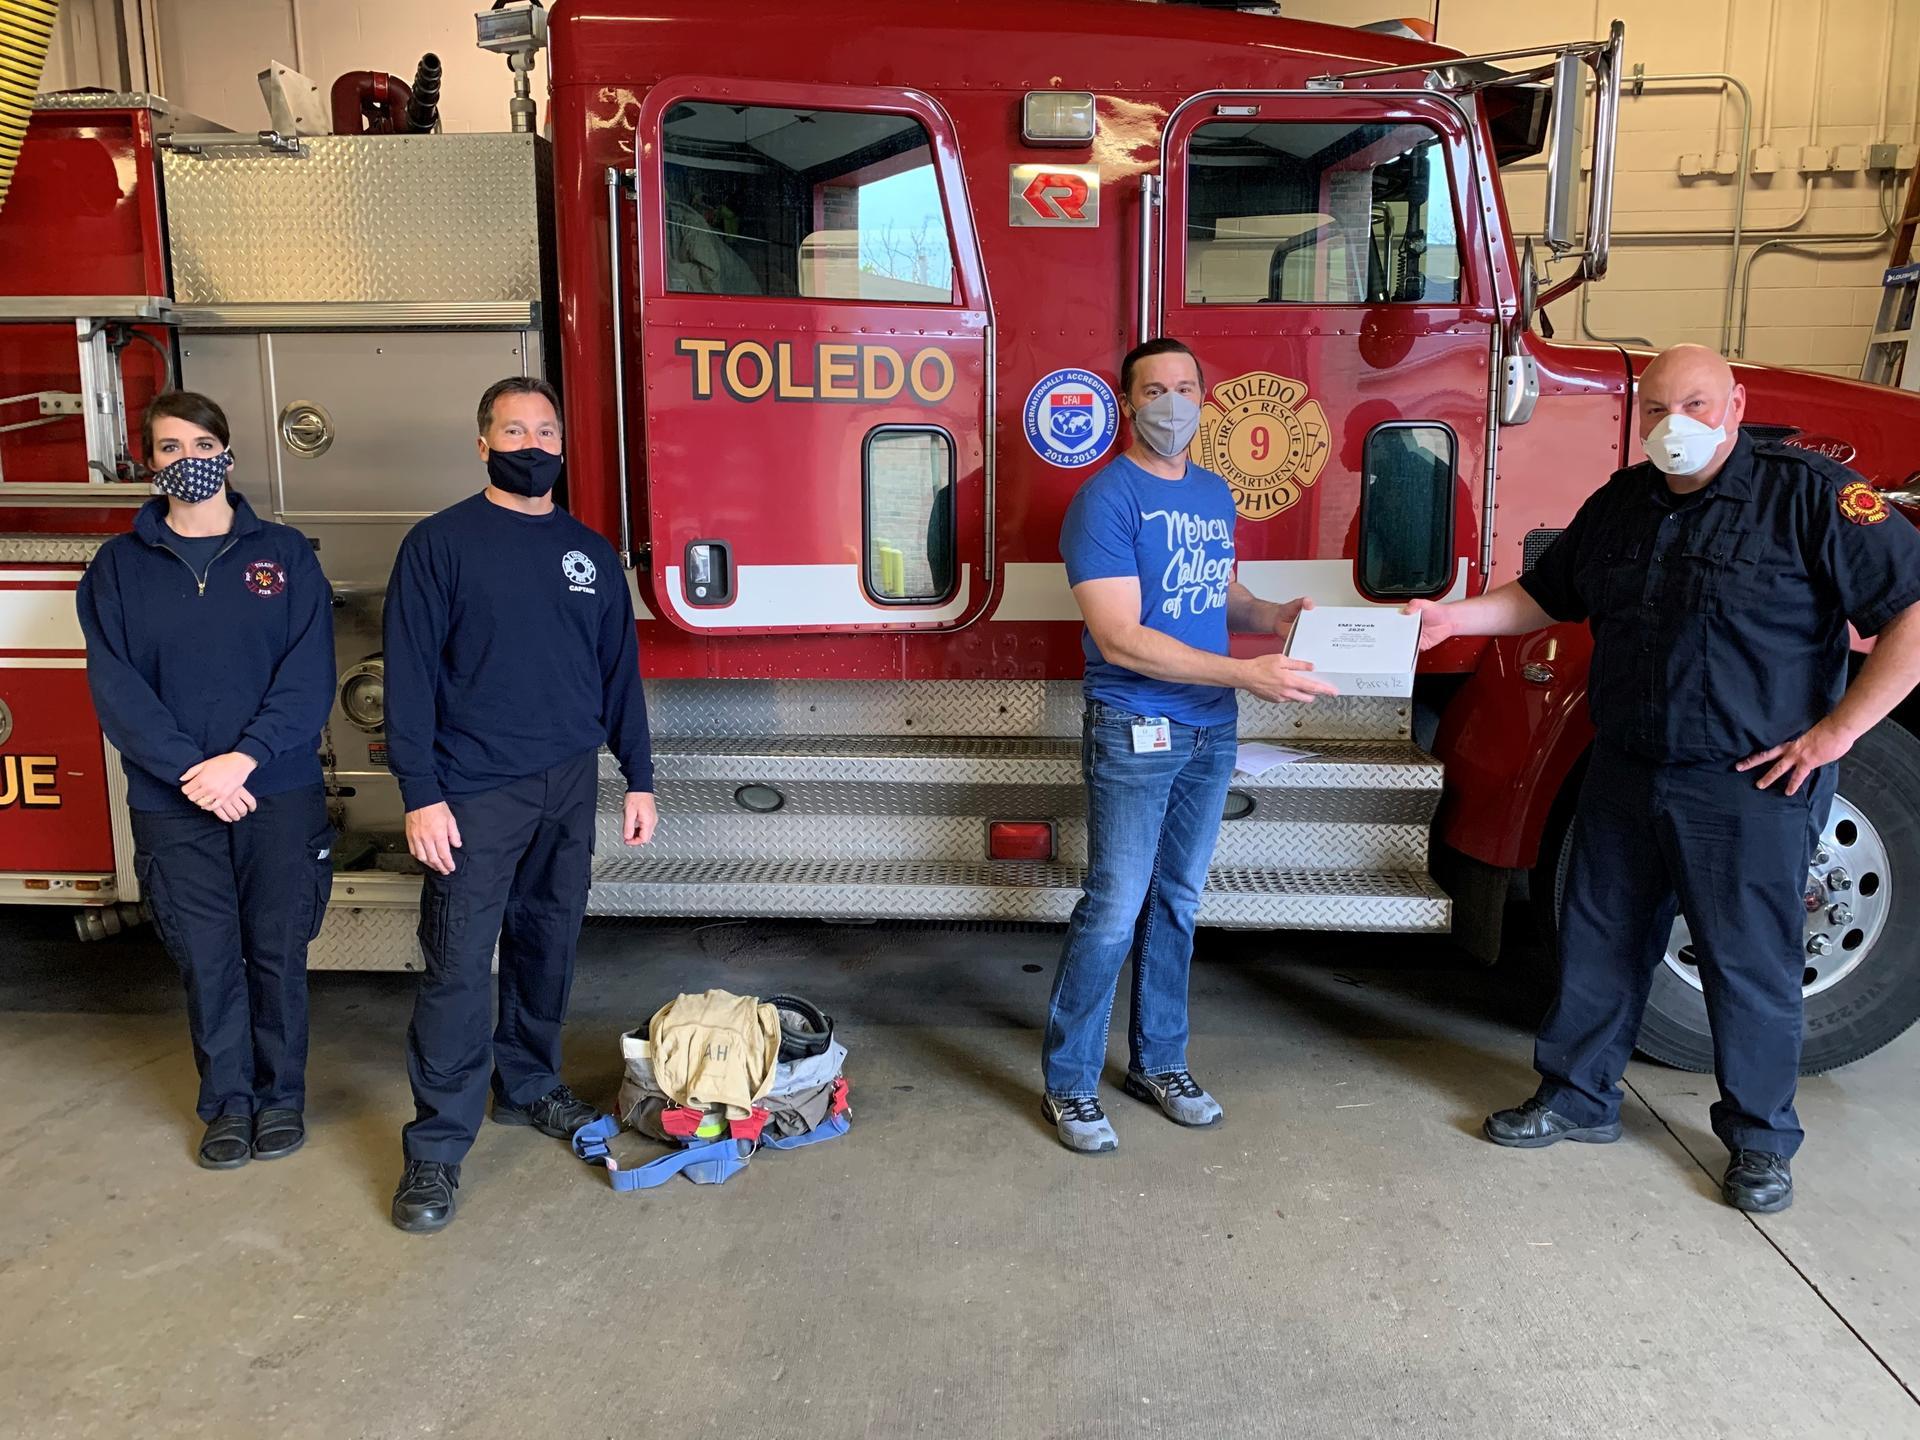 Toledo Fire Station 9